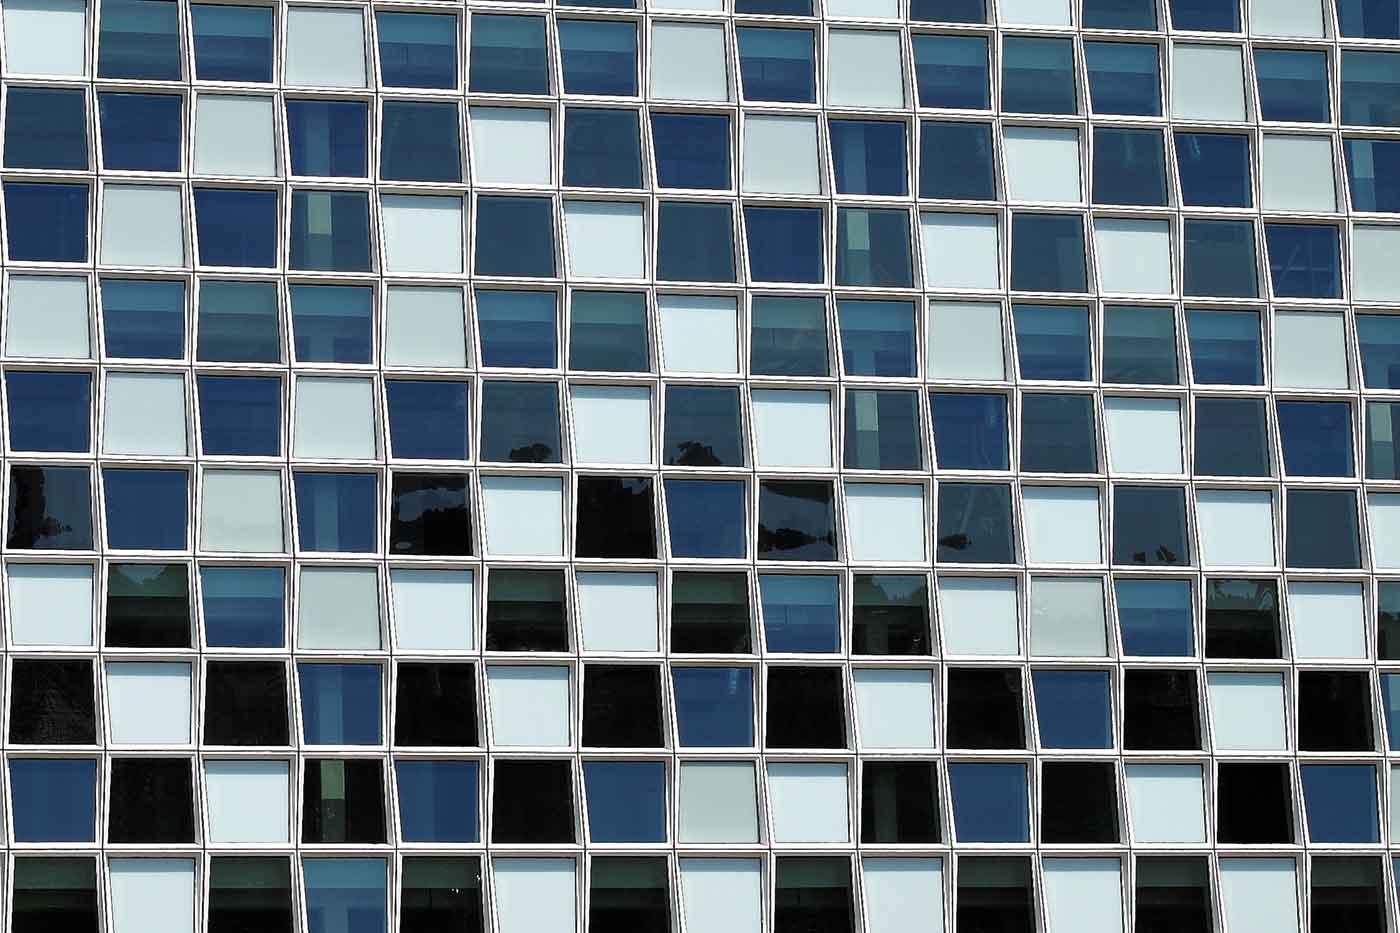 Blue and grey windows